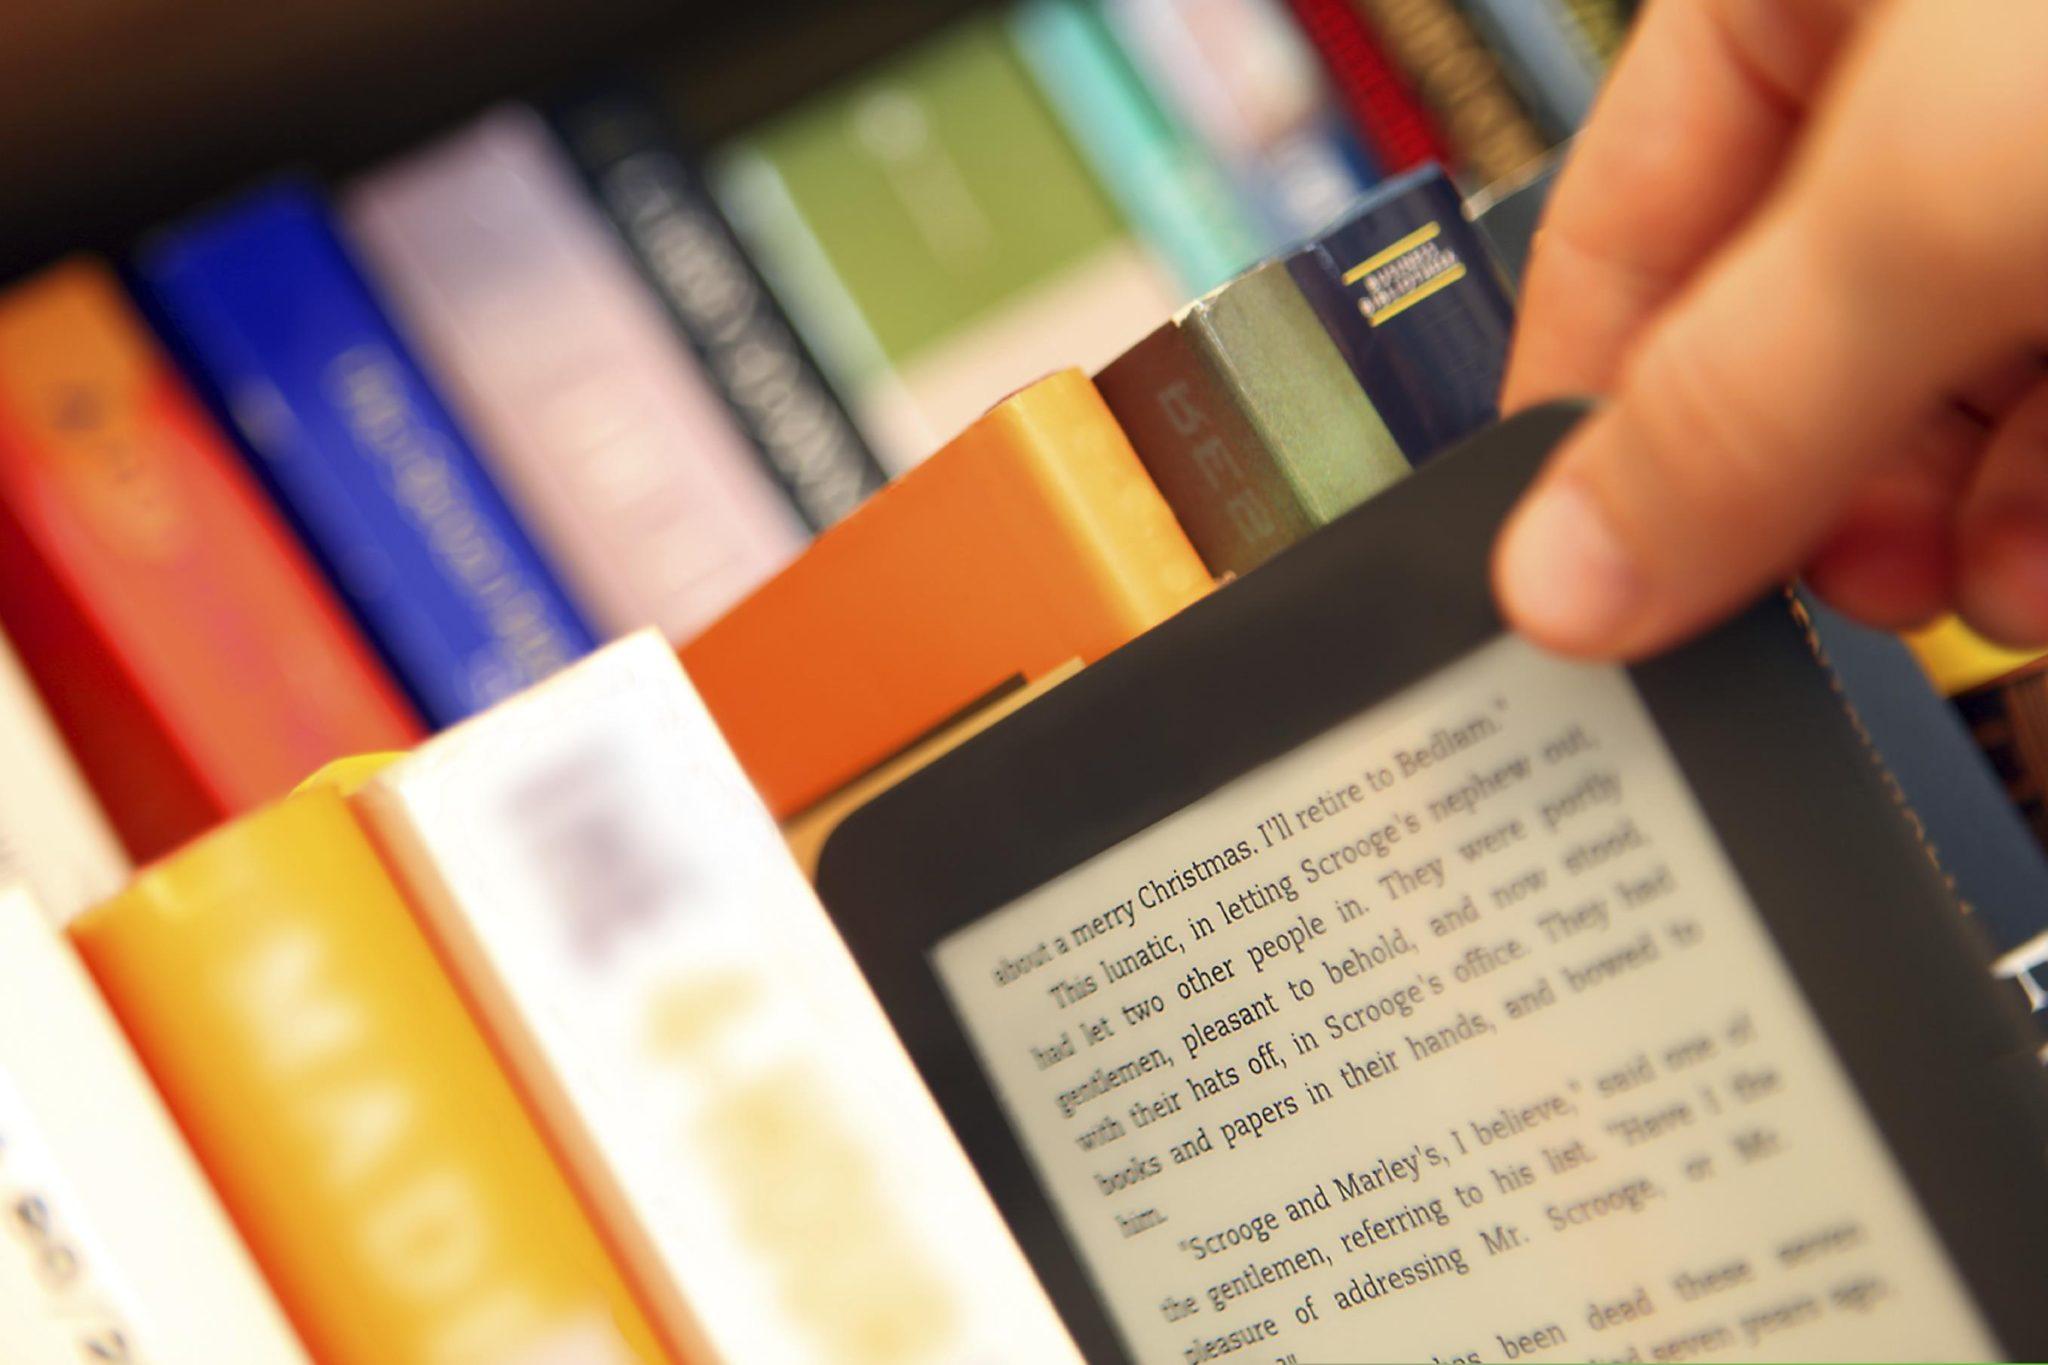 free trading eBooks   Econ Alerts